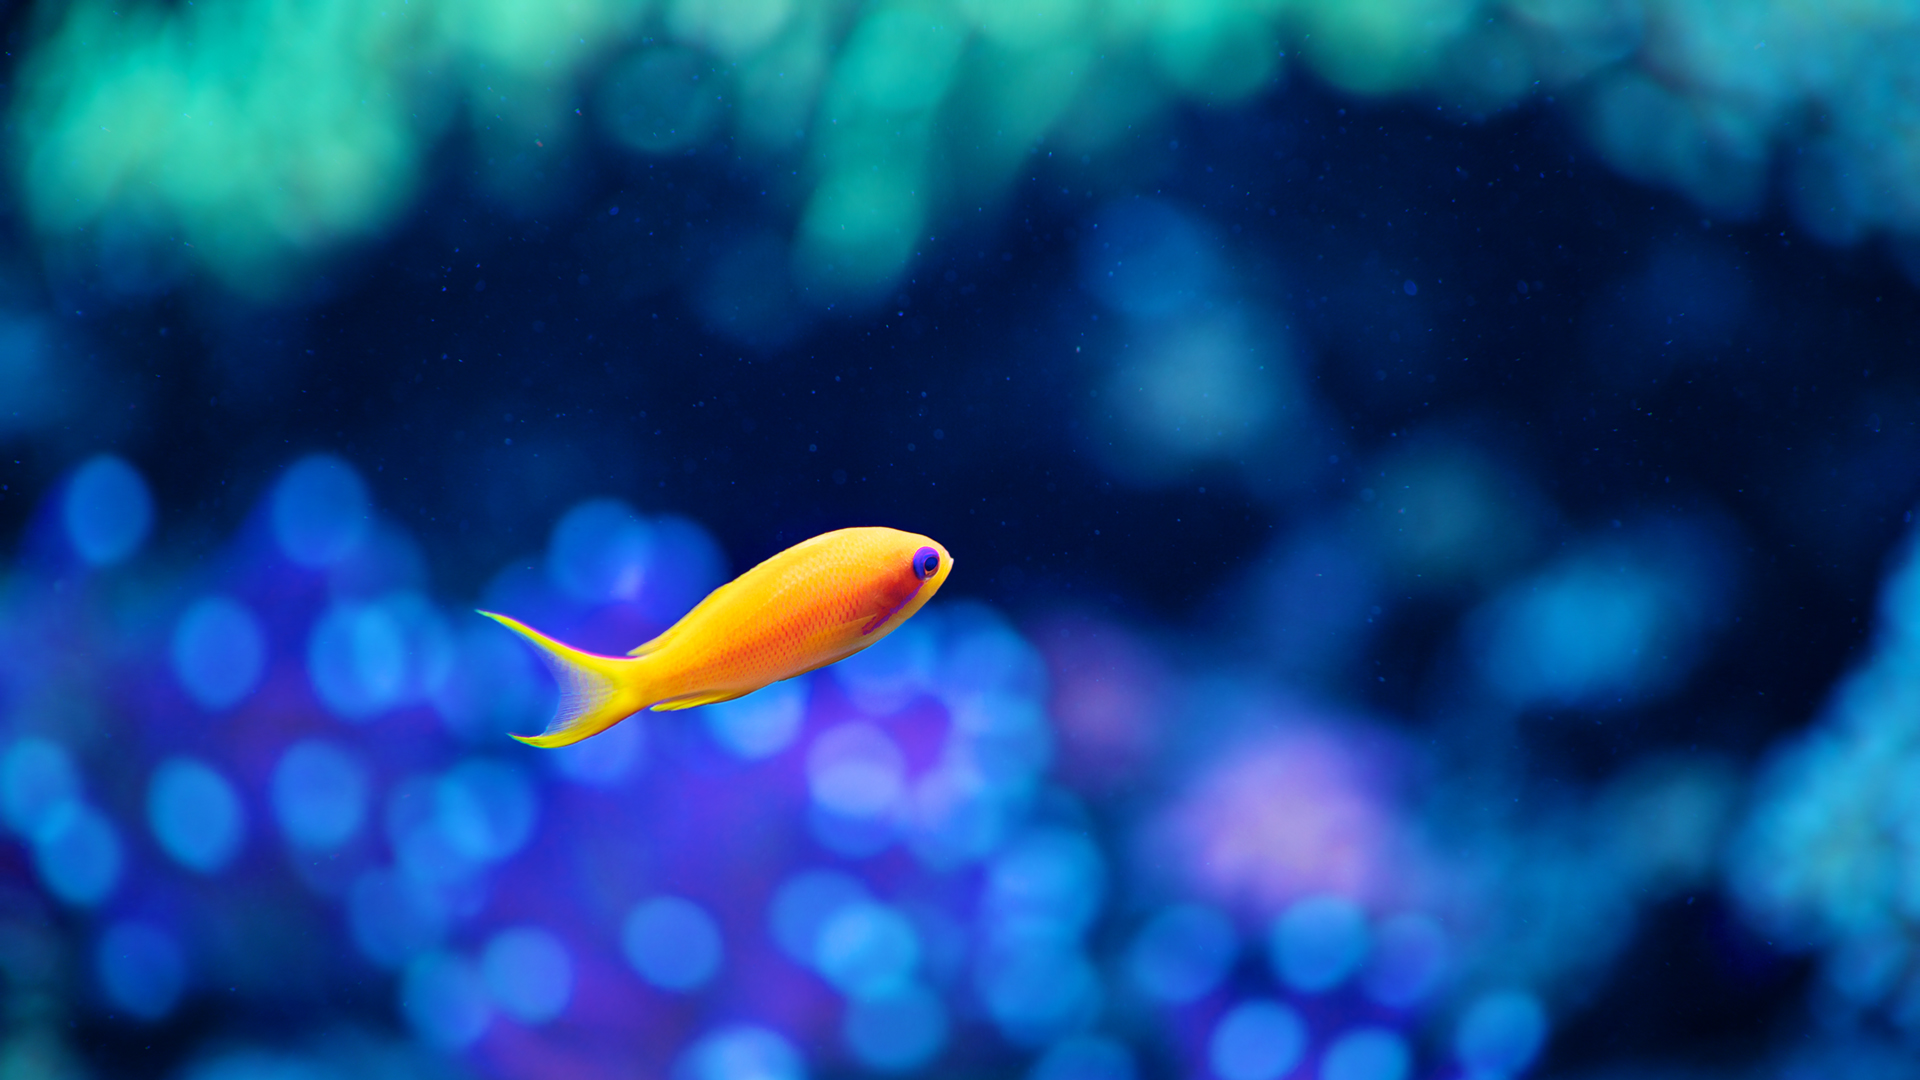 Koi 3d Wallpaper Fish Wallpapers Hd Pixelstalk Net